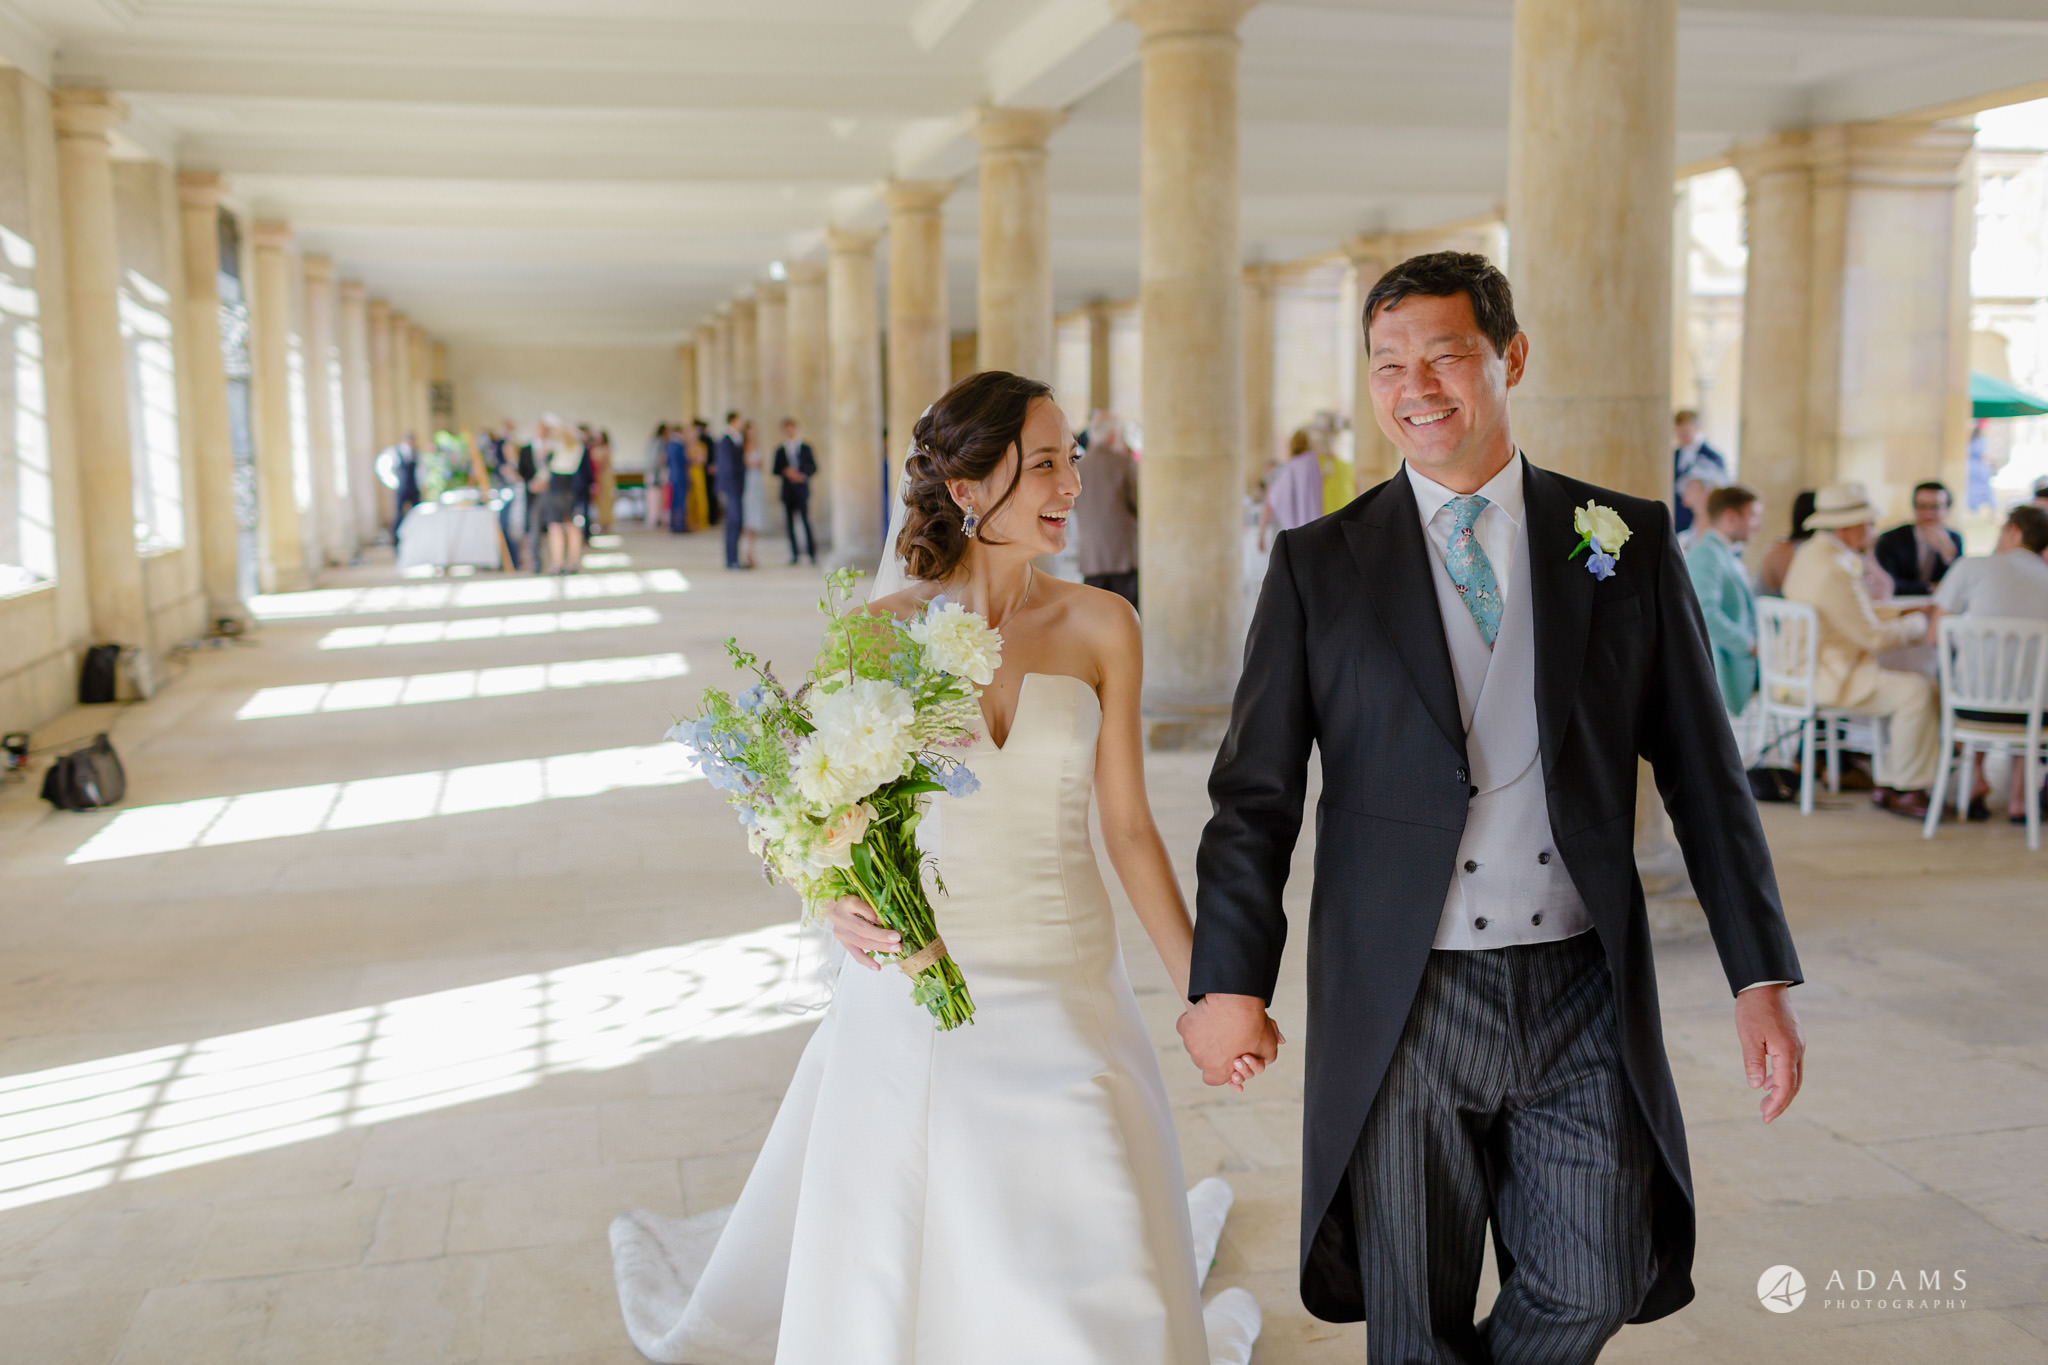 Trinity College Cambridge wedding bride walks with her father